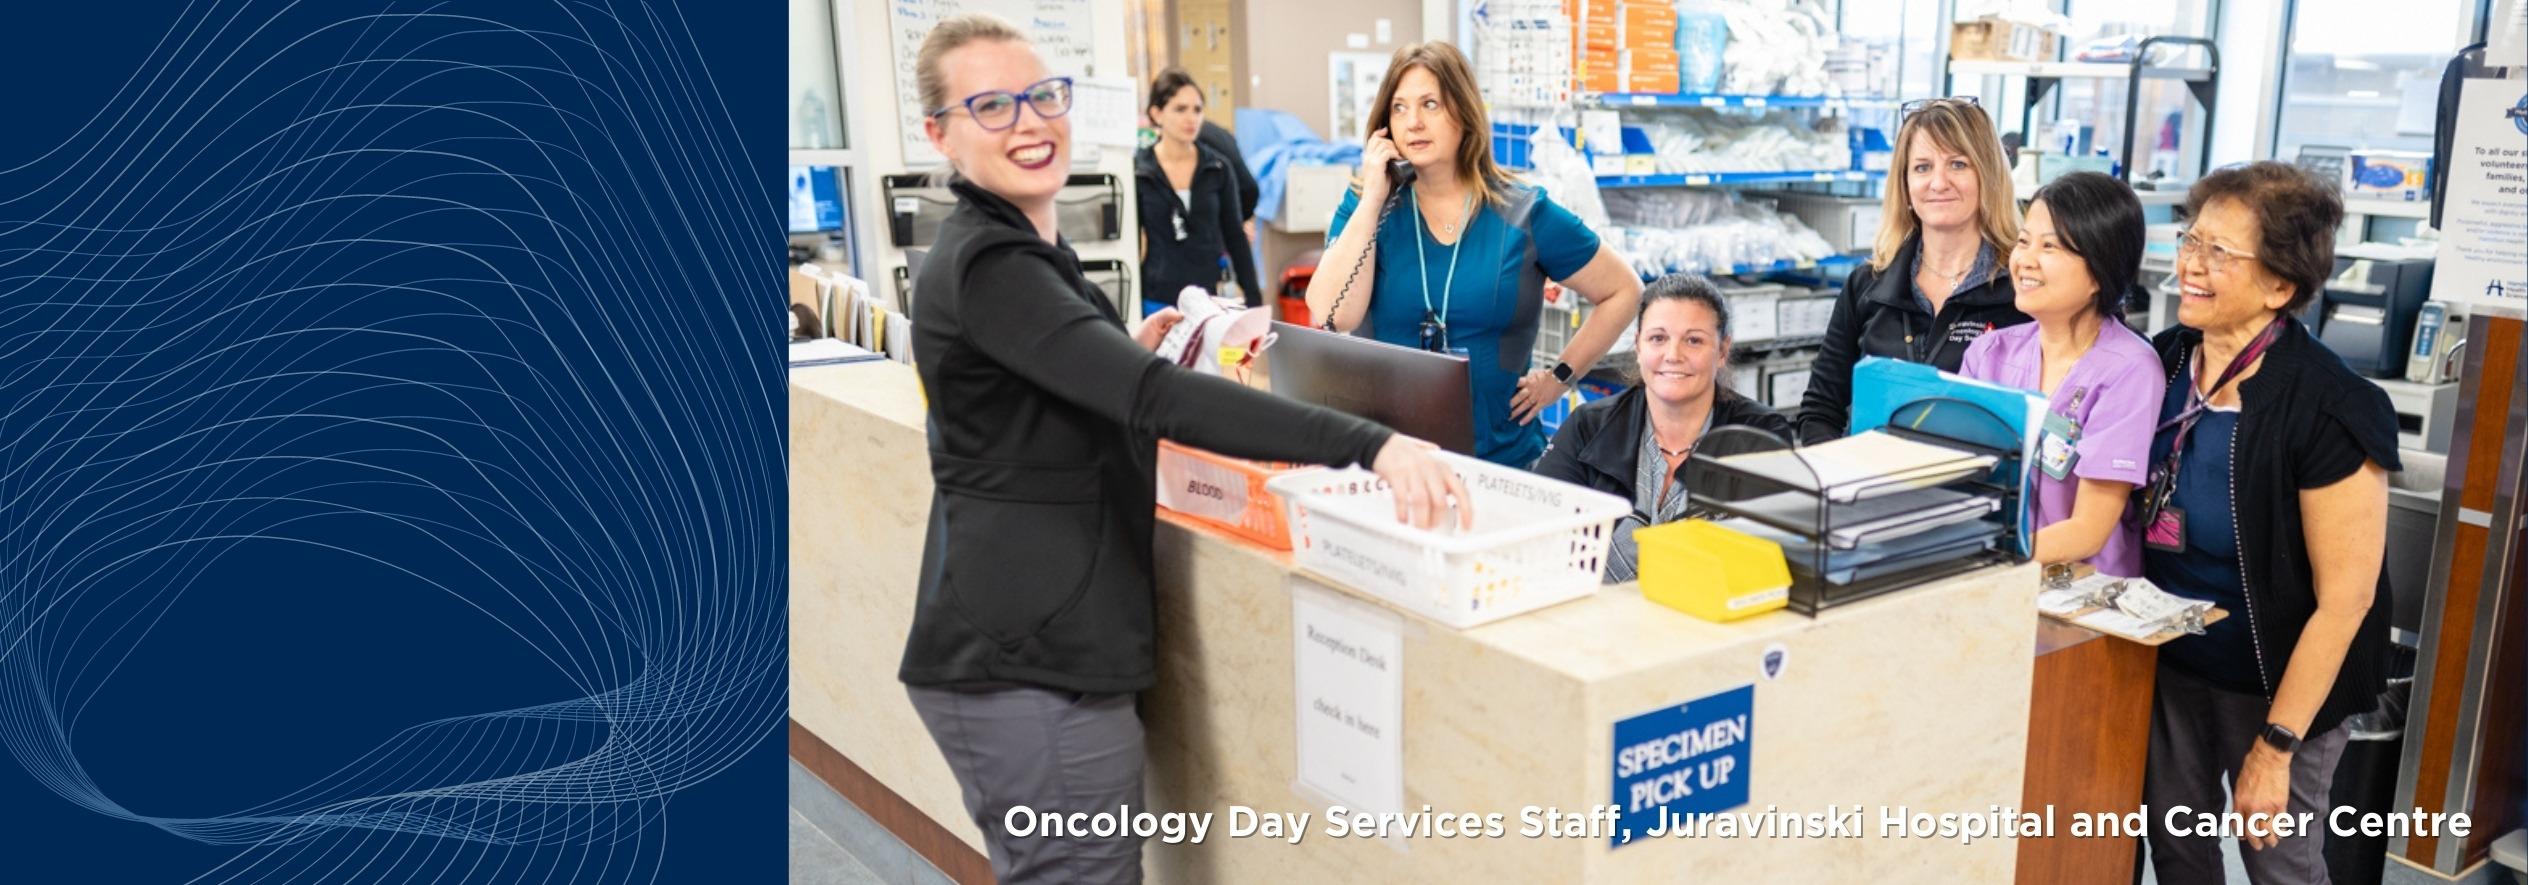 Oncology Day Services Staff, Juravinski Hospital and Cancer Centre